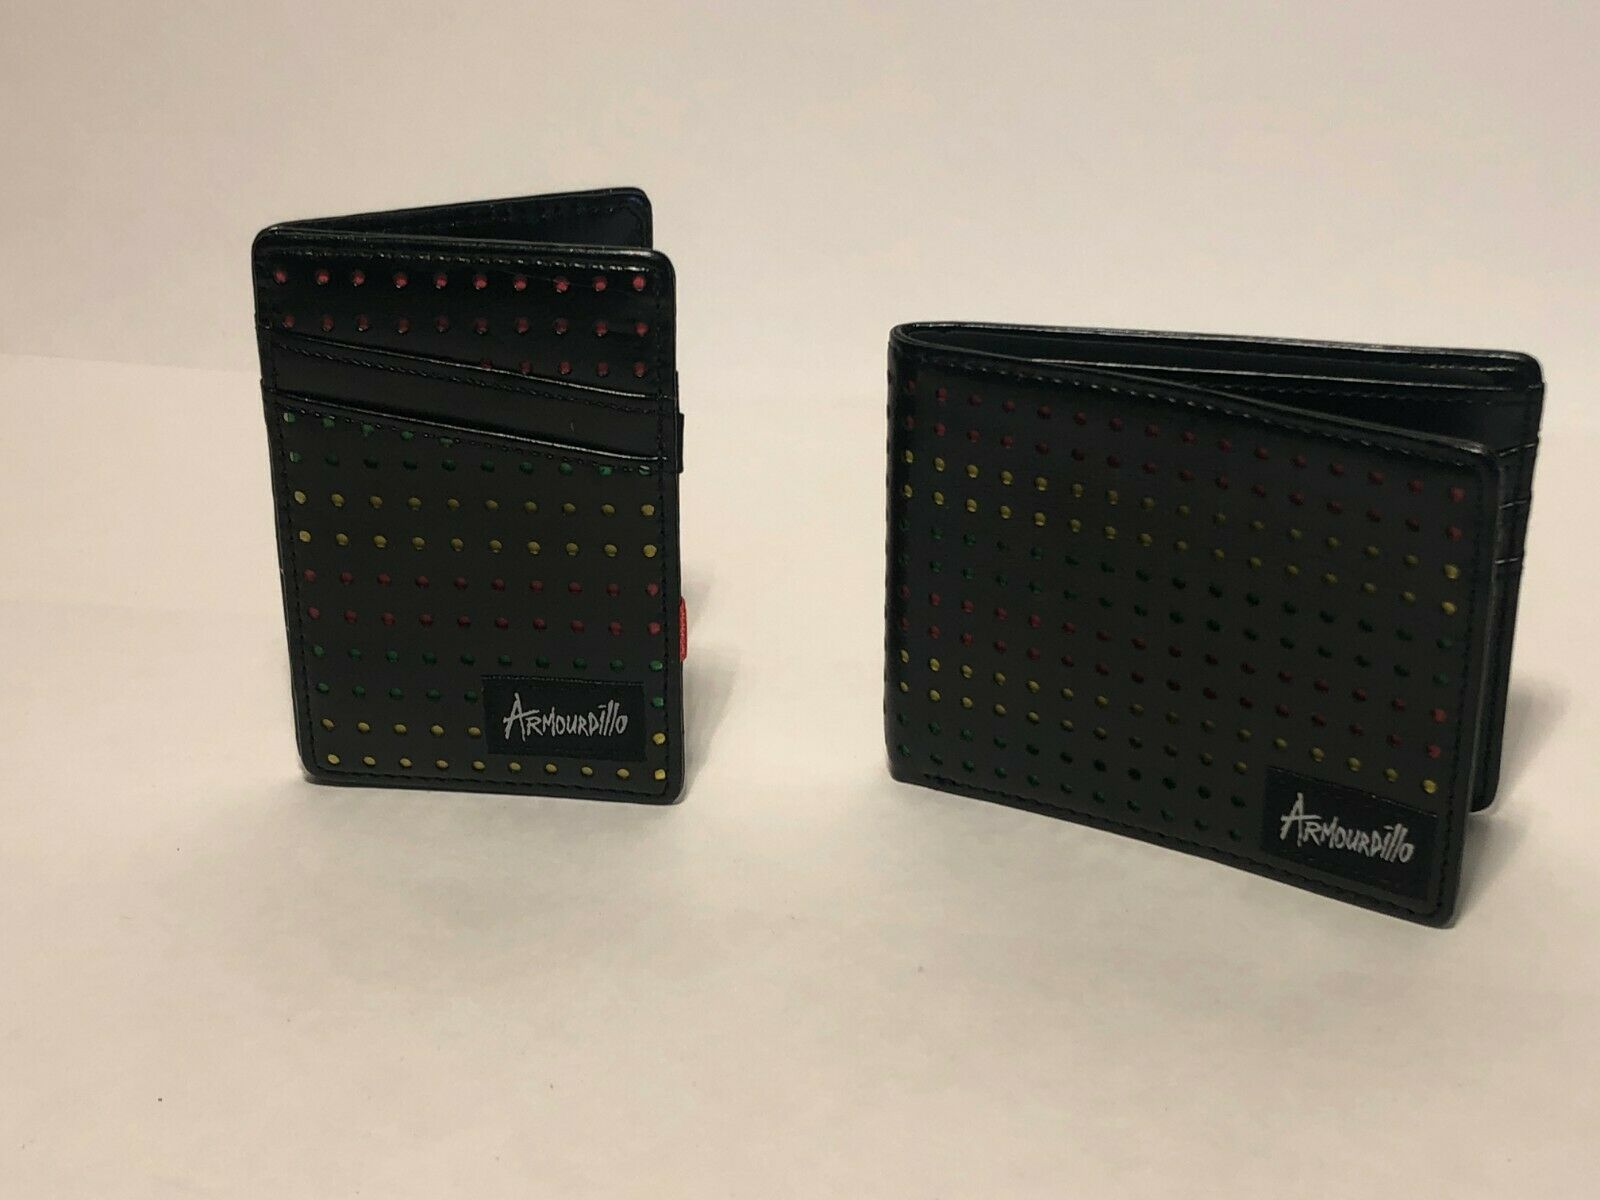 New Men's Two Piece Bi-Fold Wallet/Cardholder Set-ARMOURDILLO Raggae-Lightweight